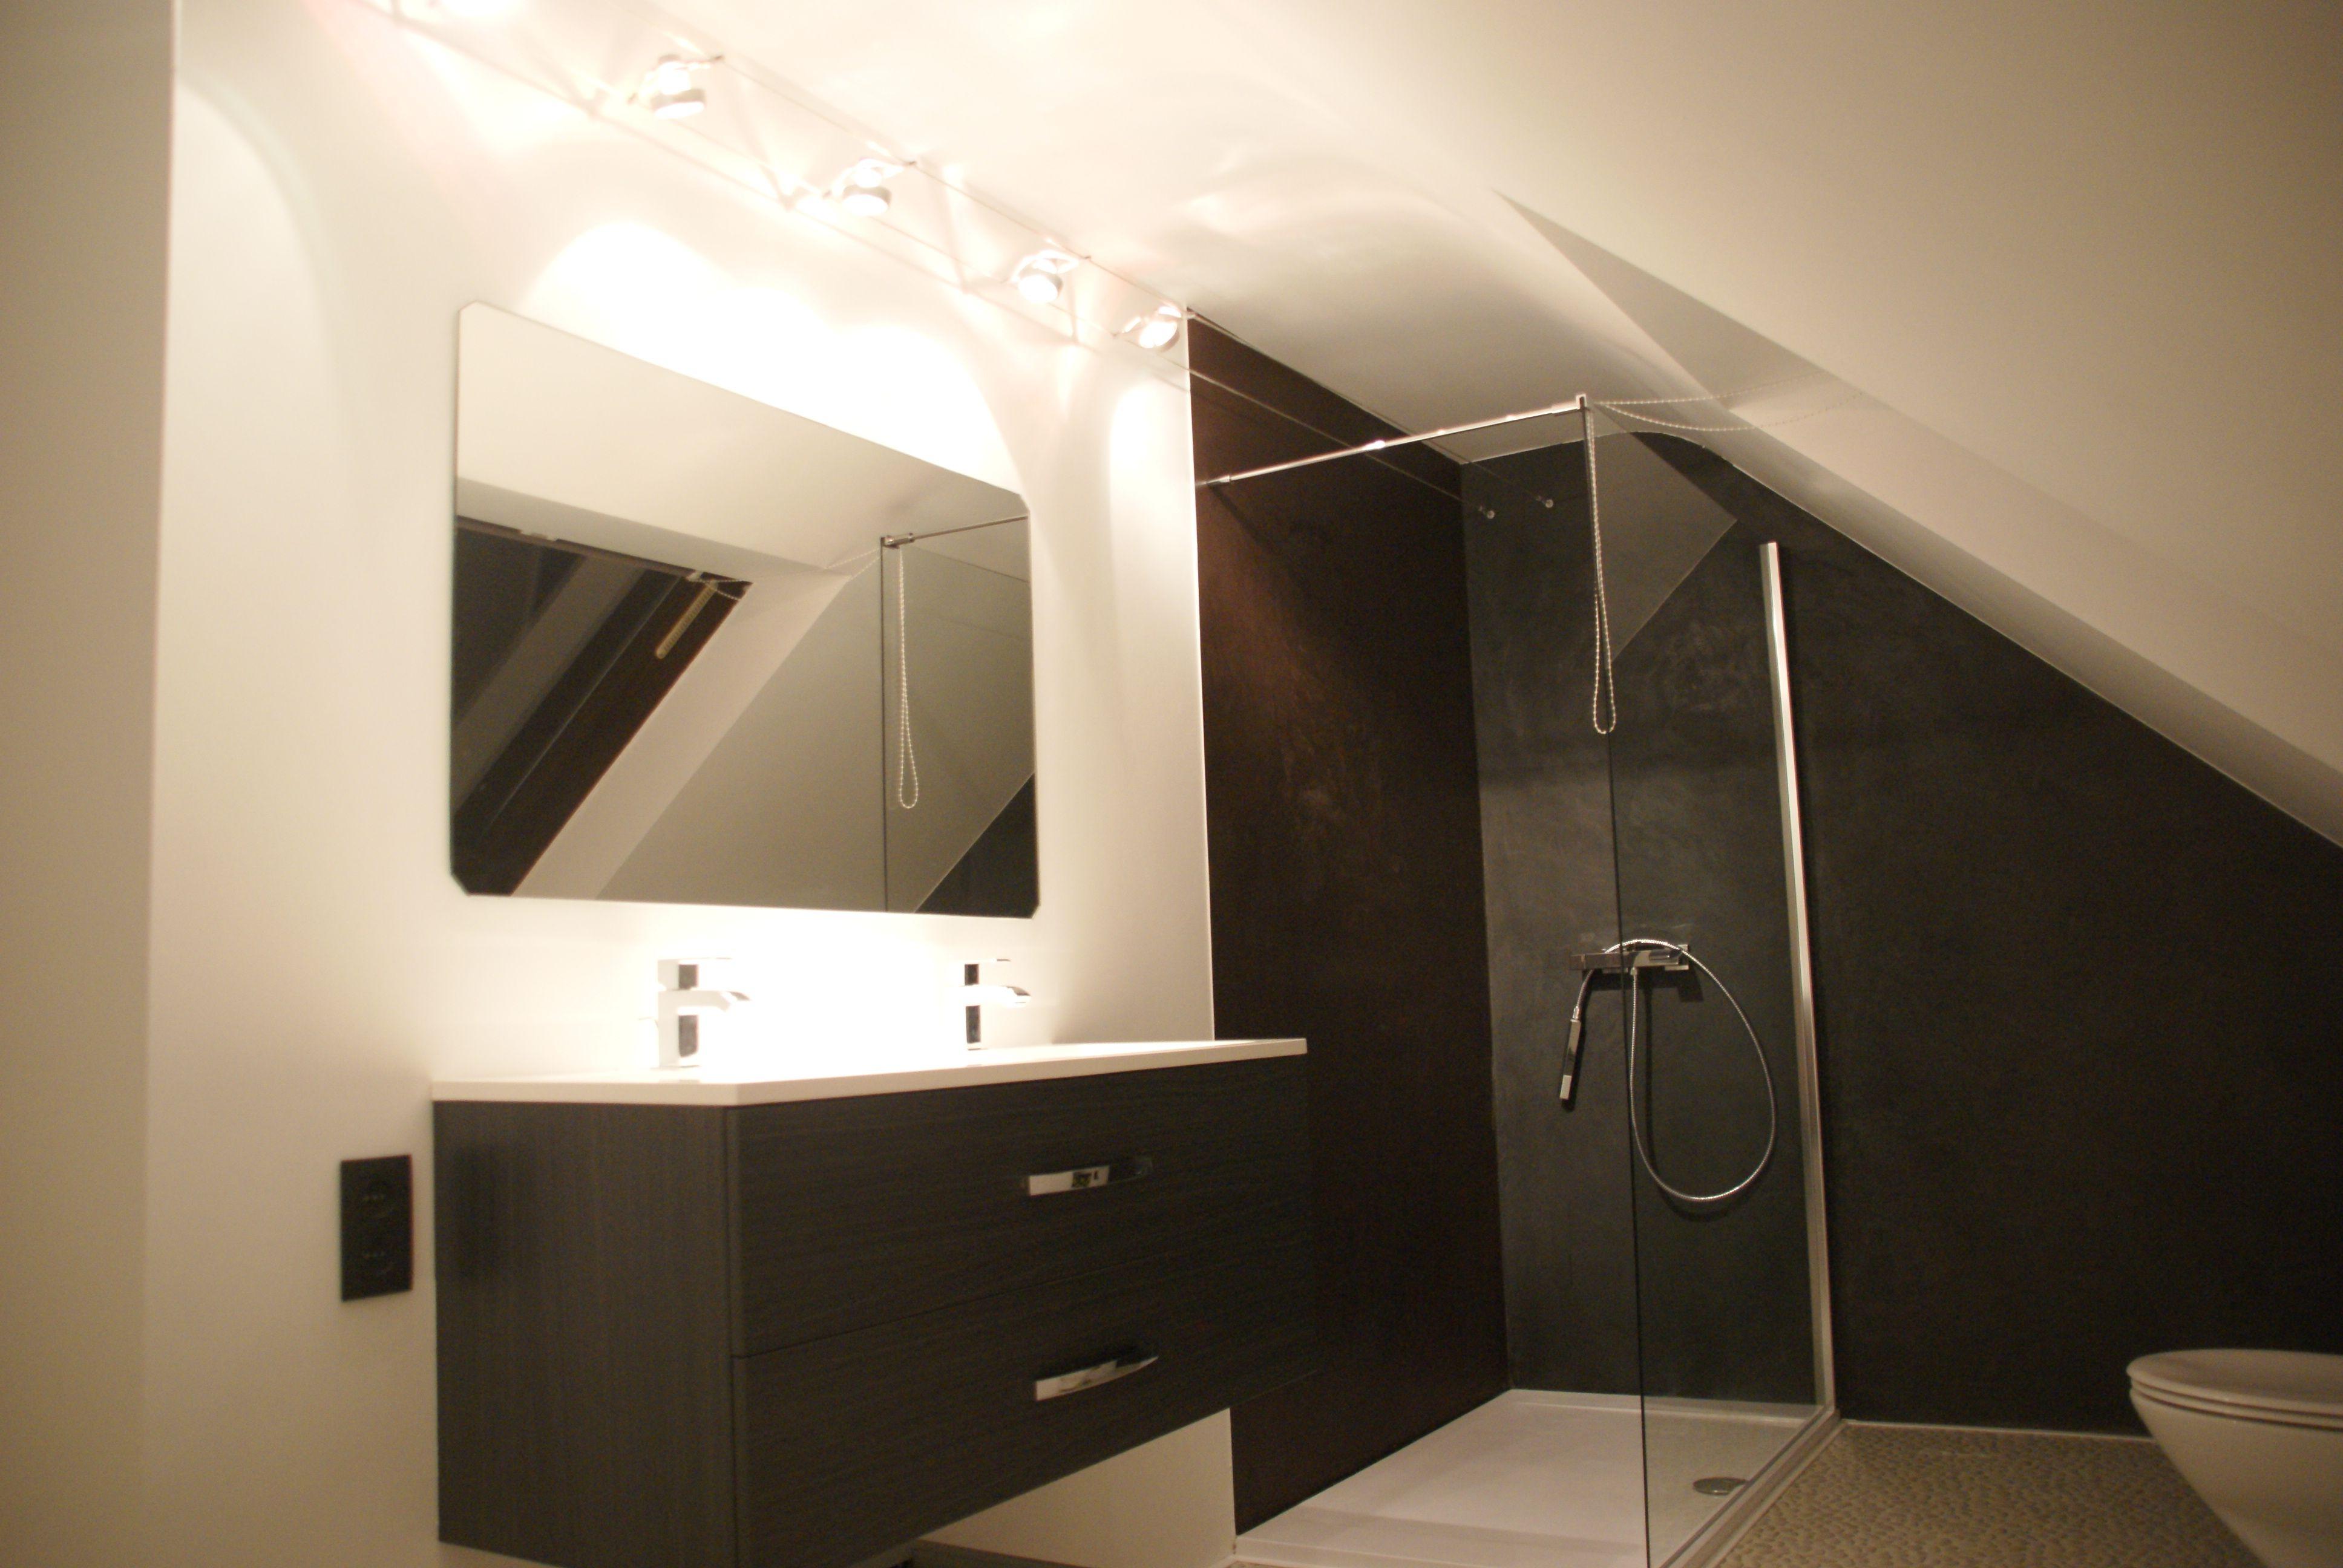 Mortex badkamer schuin dak huis bathroom pinterest attic bathroom and attic - Badkamer mansard ...